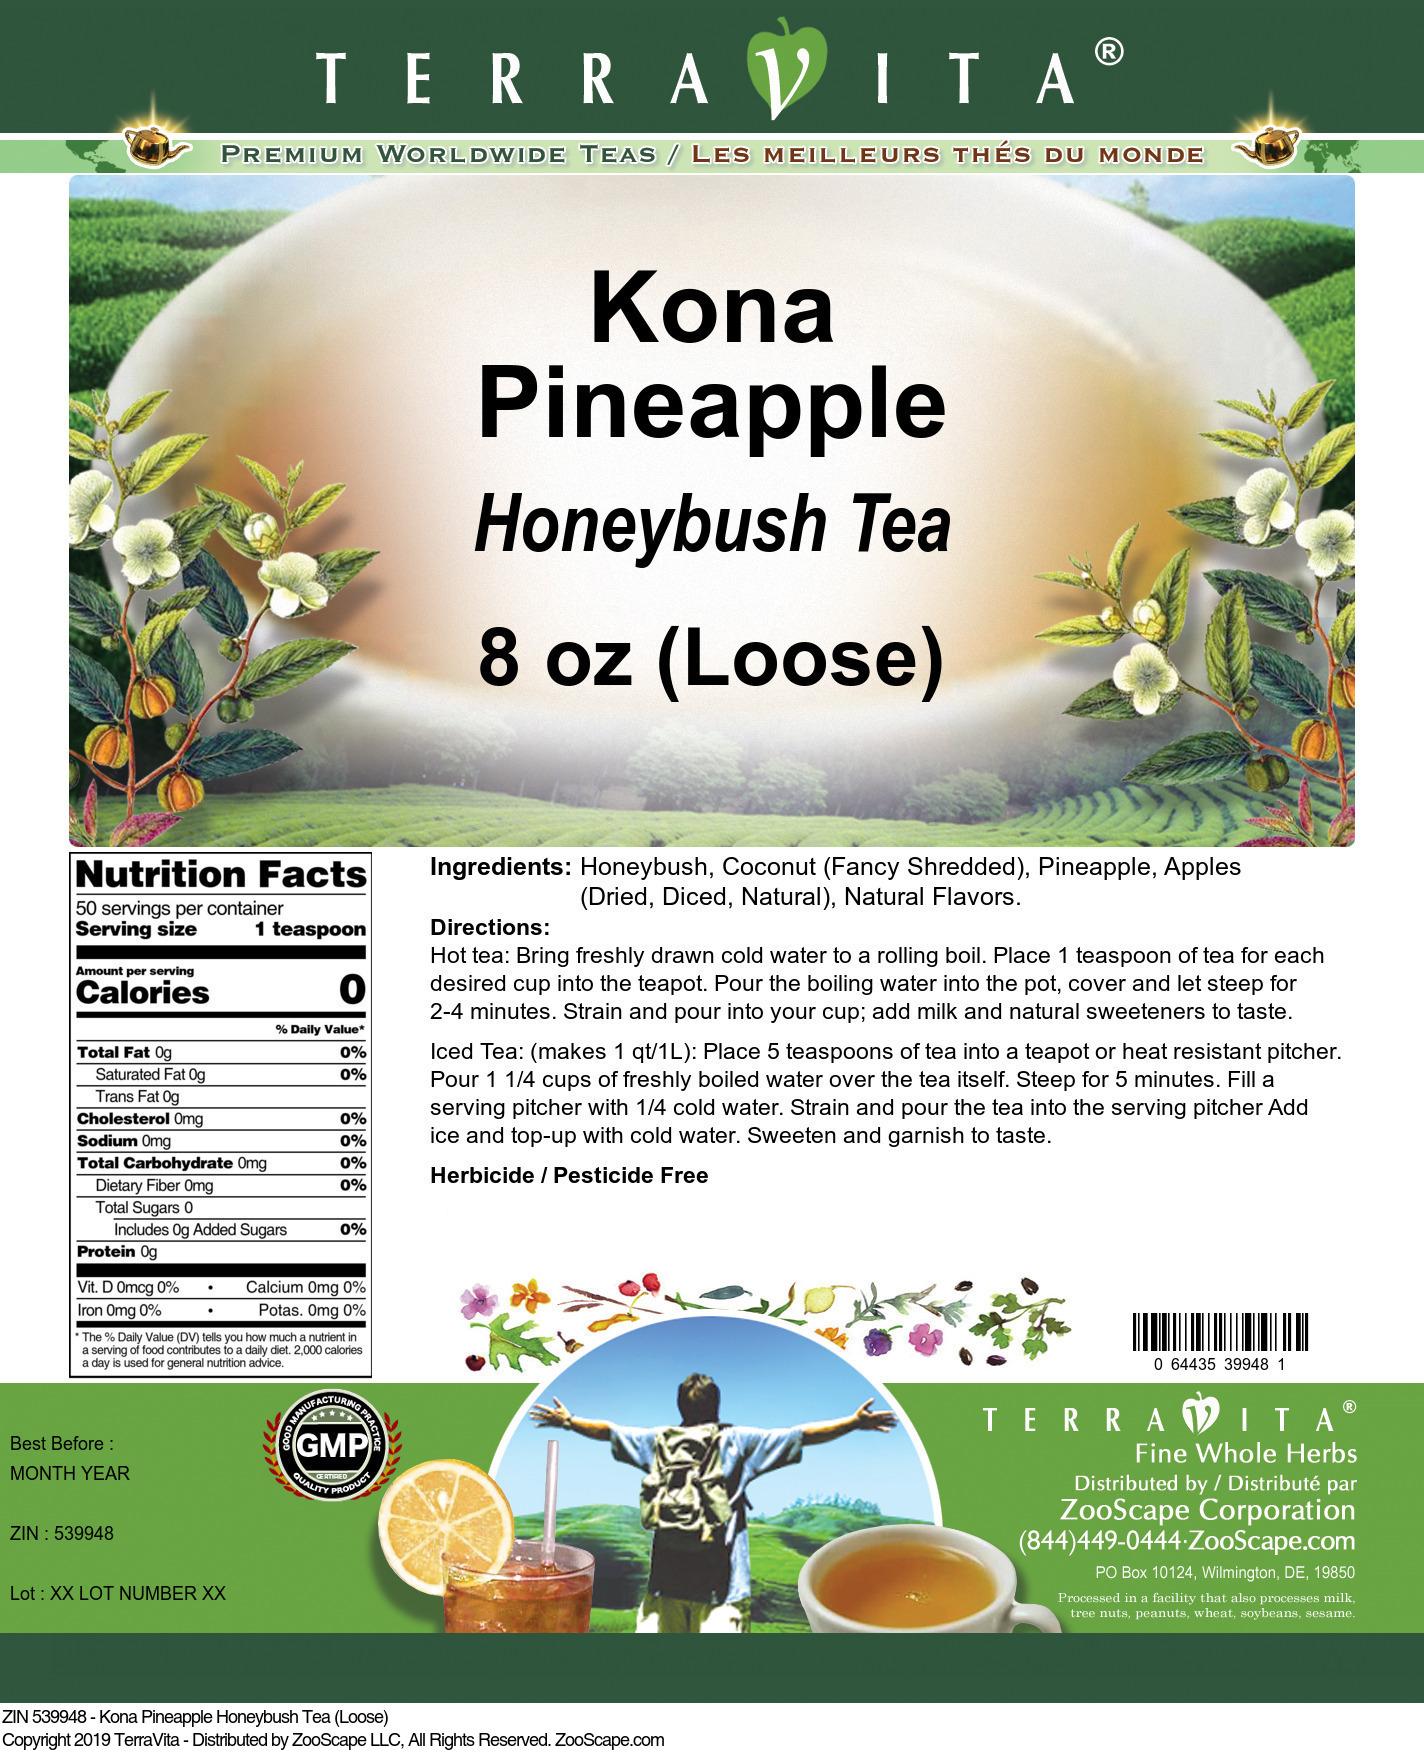 Kona Pineapple Honeybush Tea (Loose)